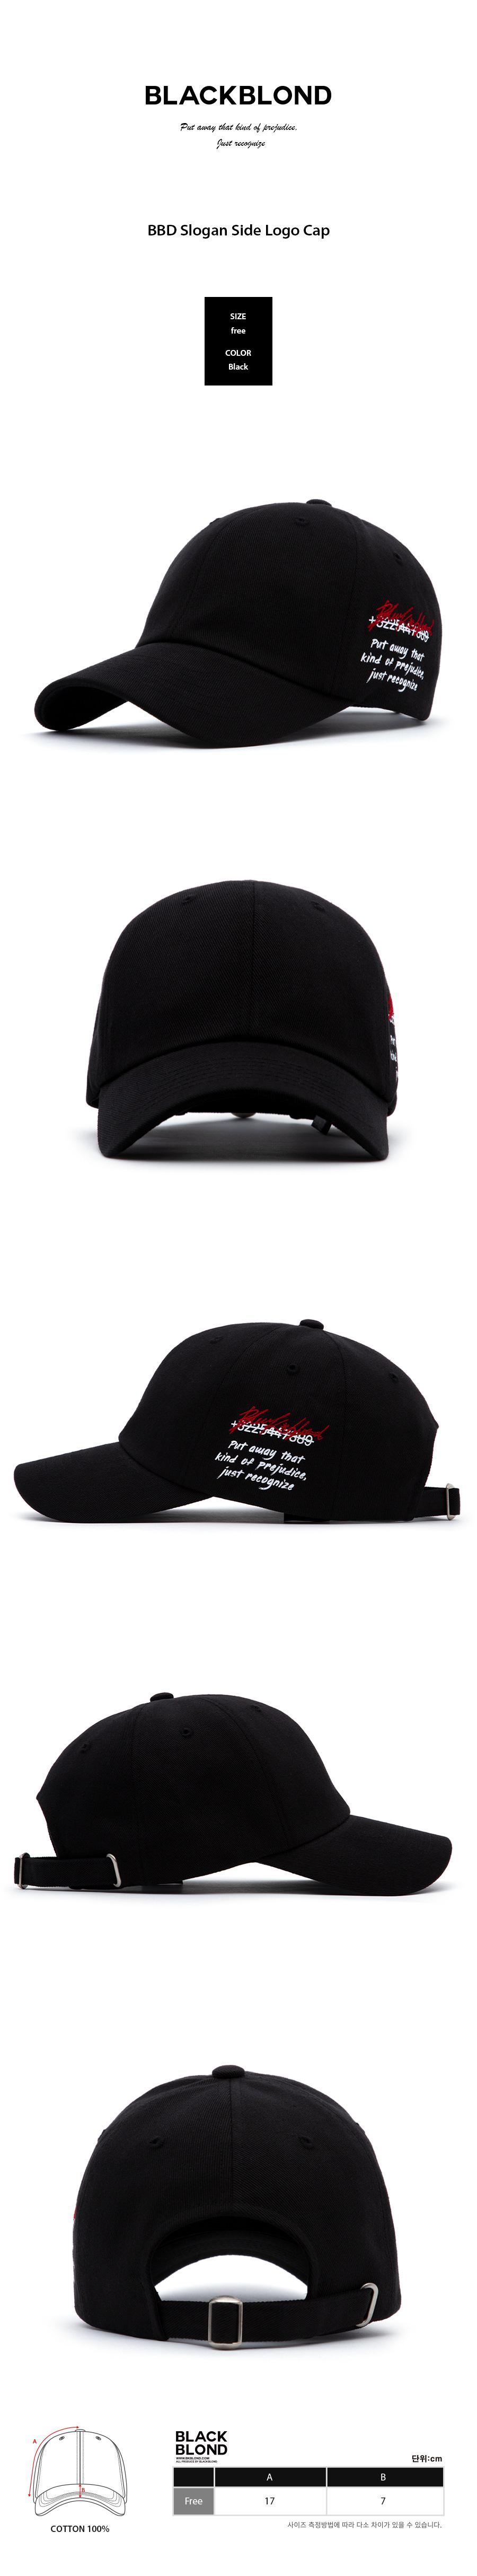 BLACKBLOND - BBD Slogan Side Logo Cap (Black)